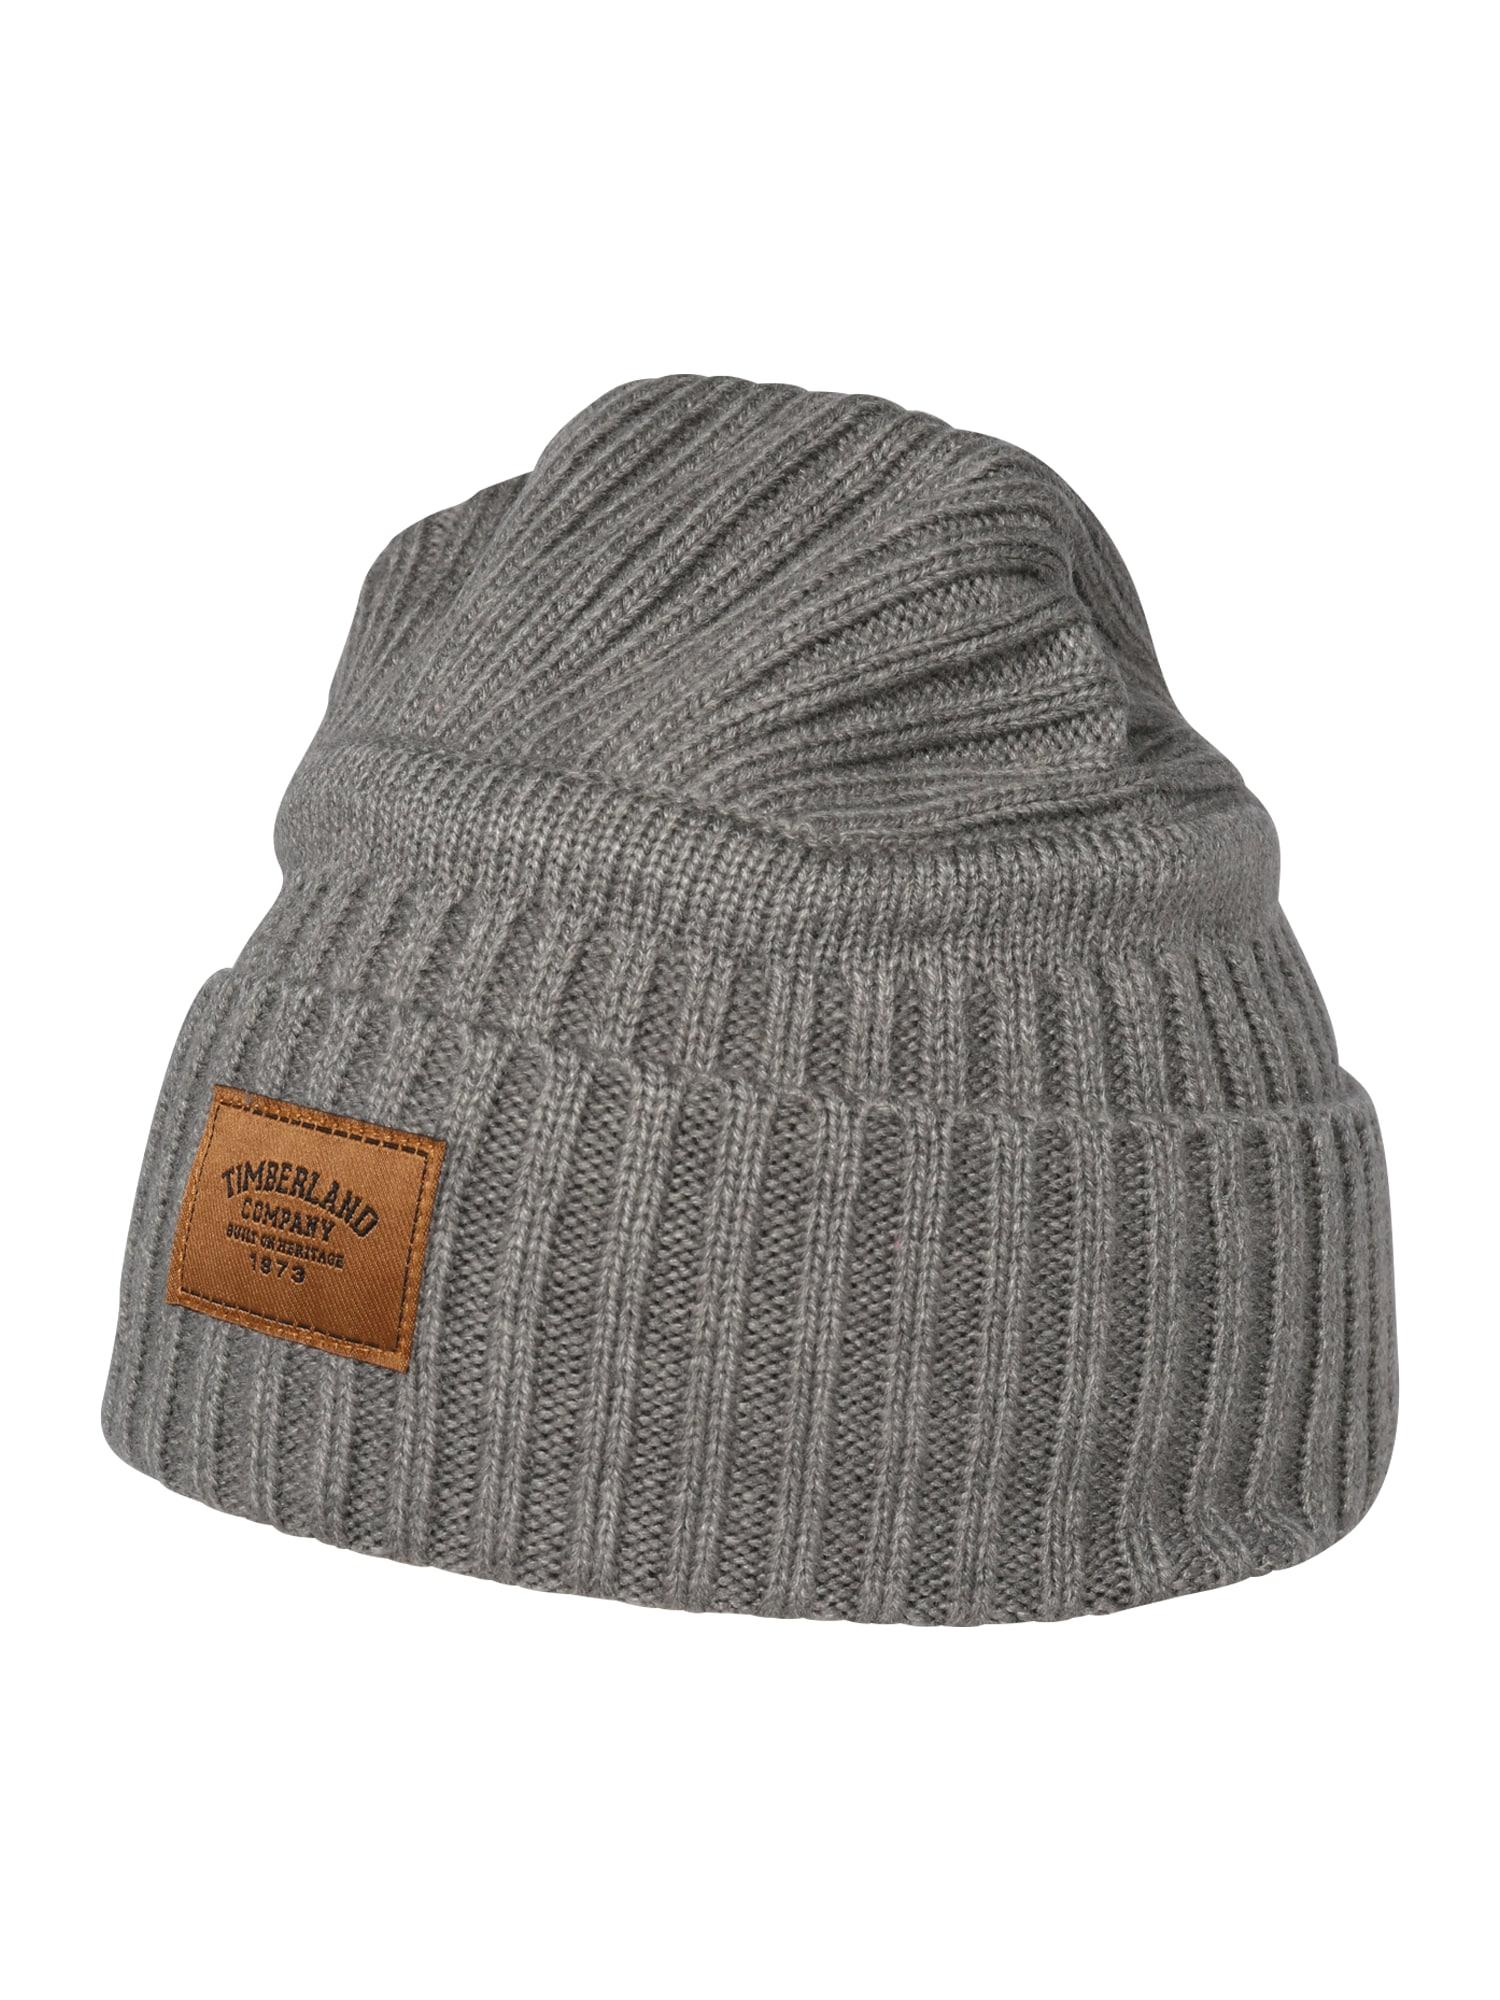 TIMBERLAND Megzta kepurė karamelės / pilka